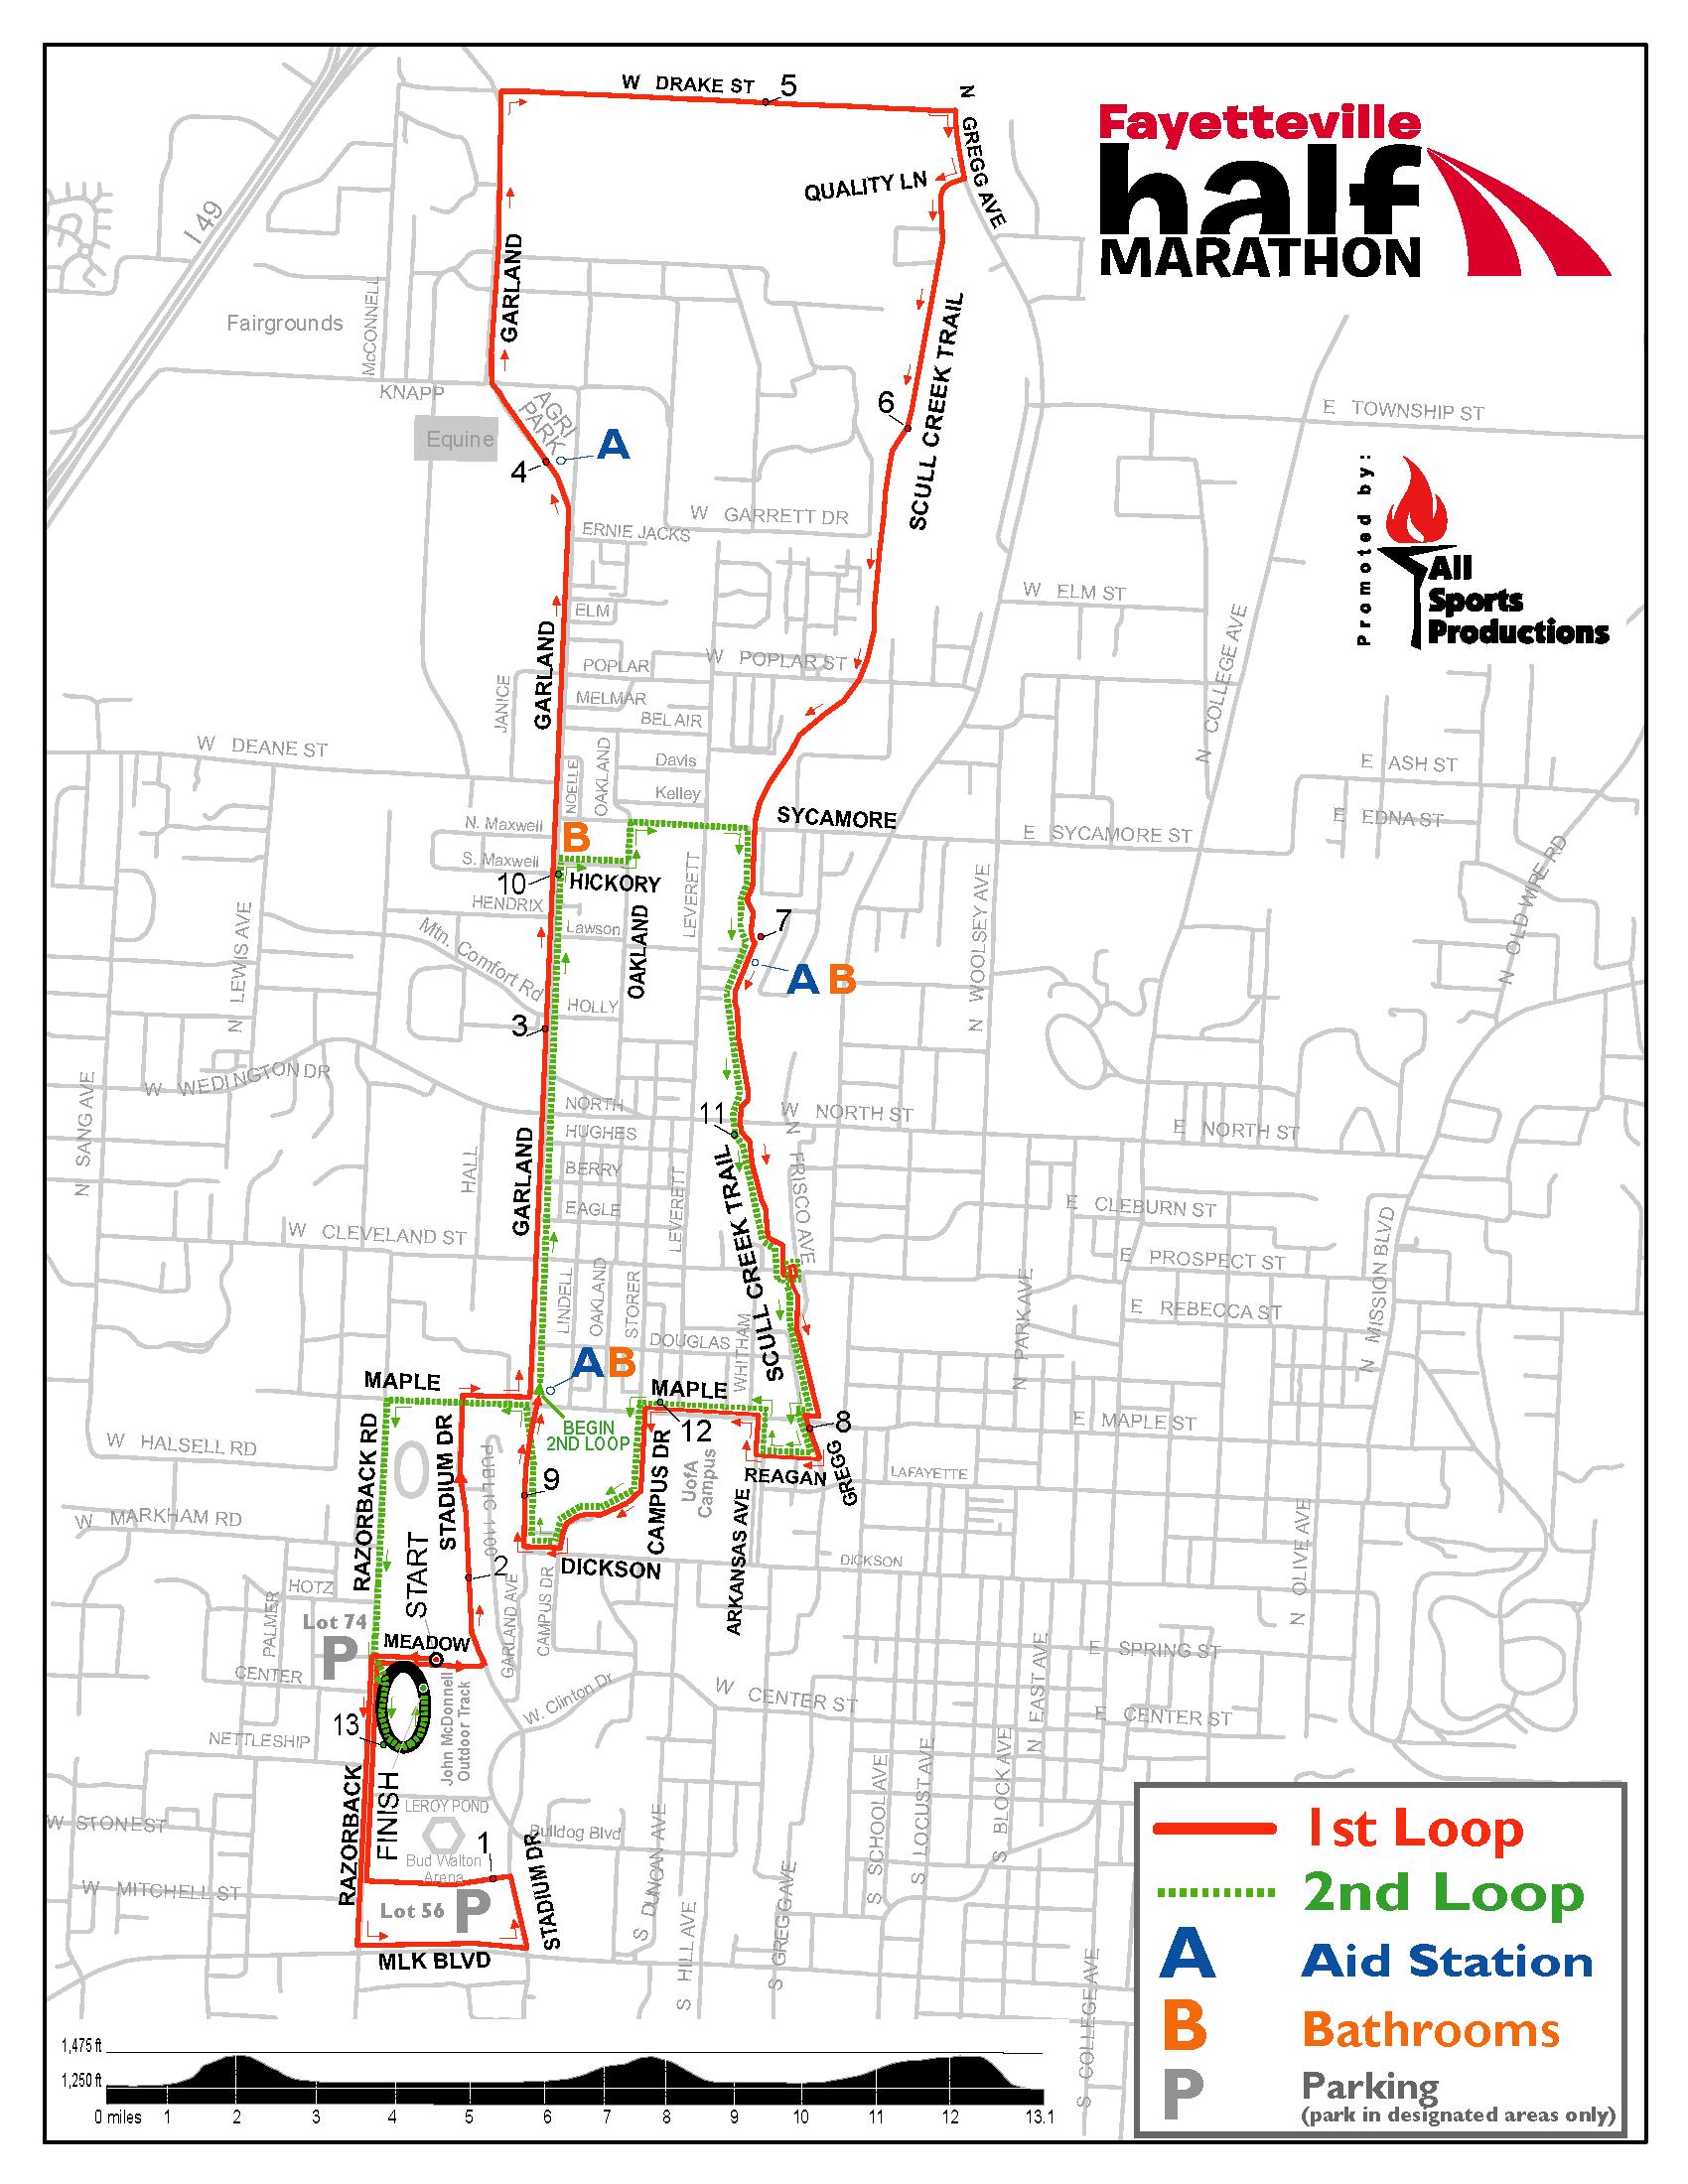 fay-marathon-map